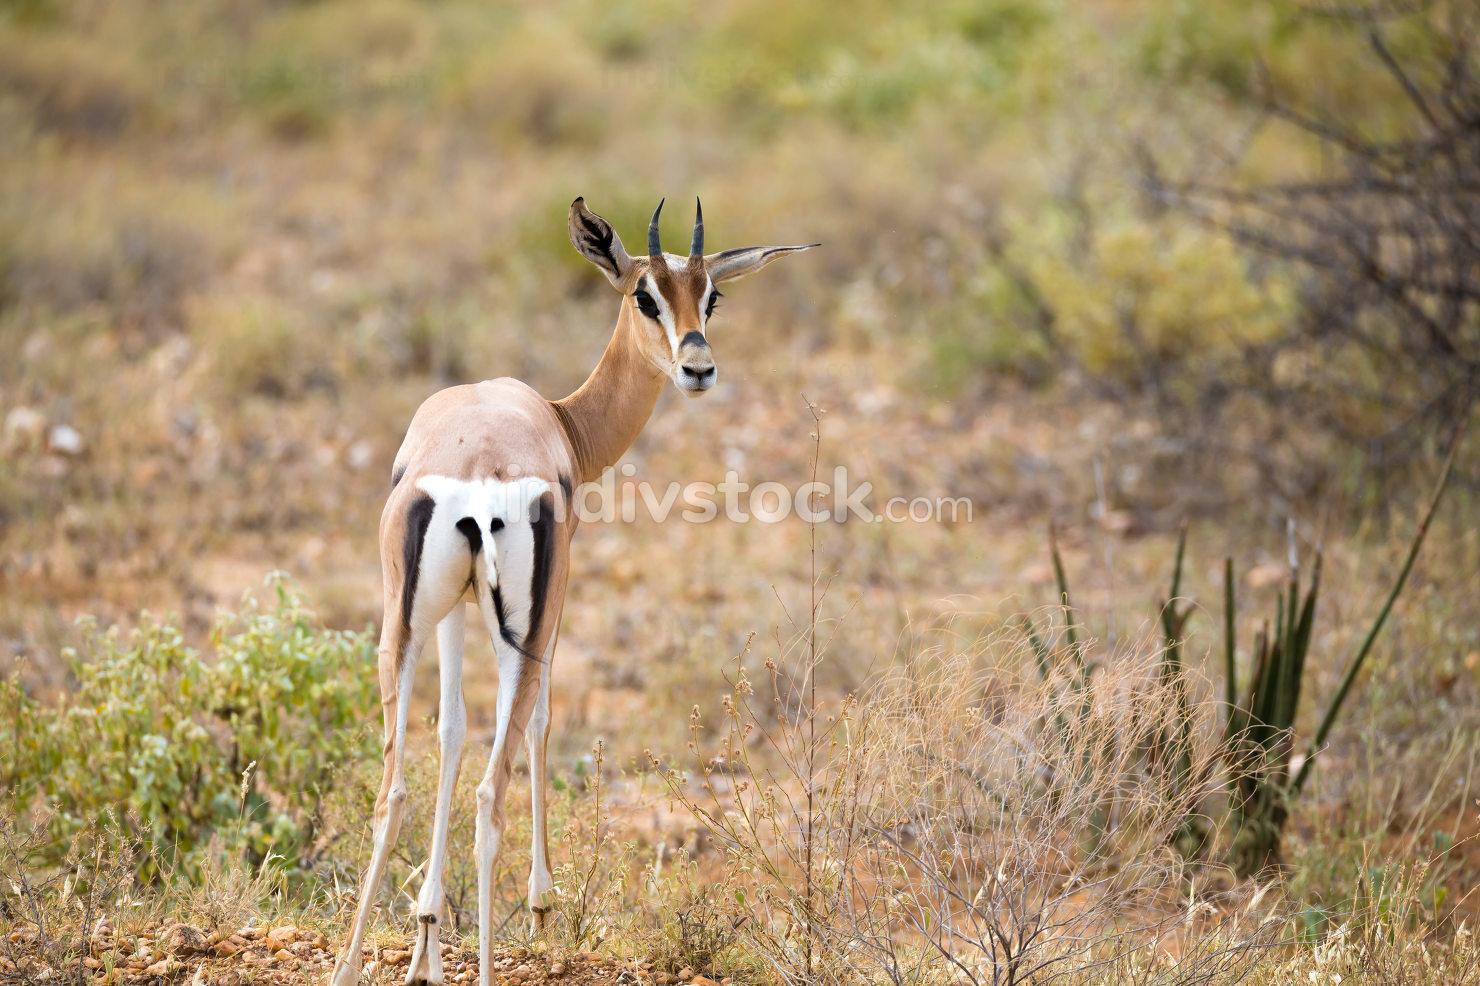 Native antelopes in the grasland of the Kenyan savannah